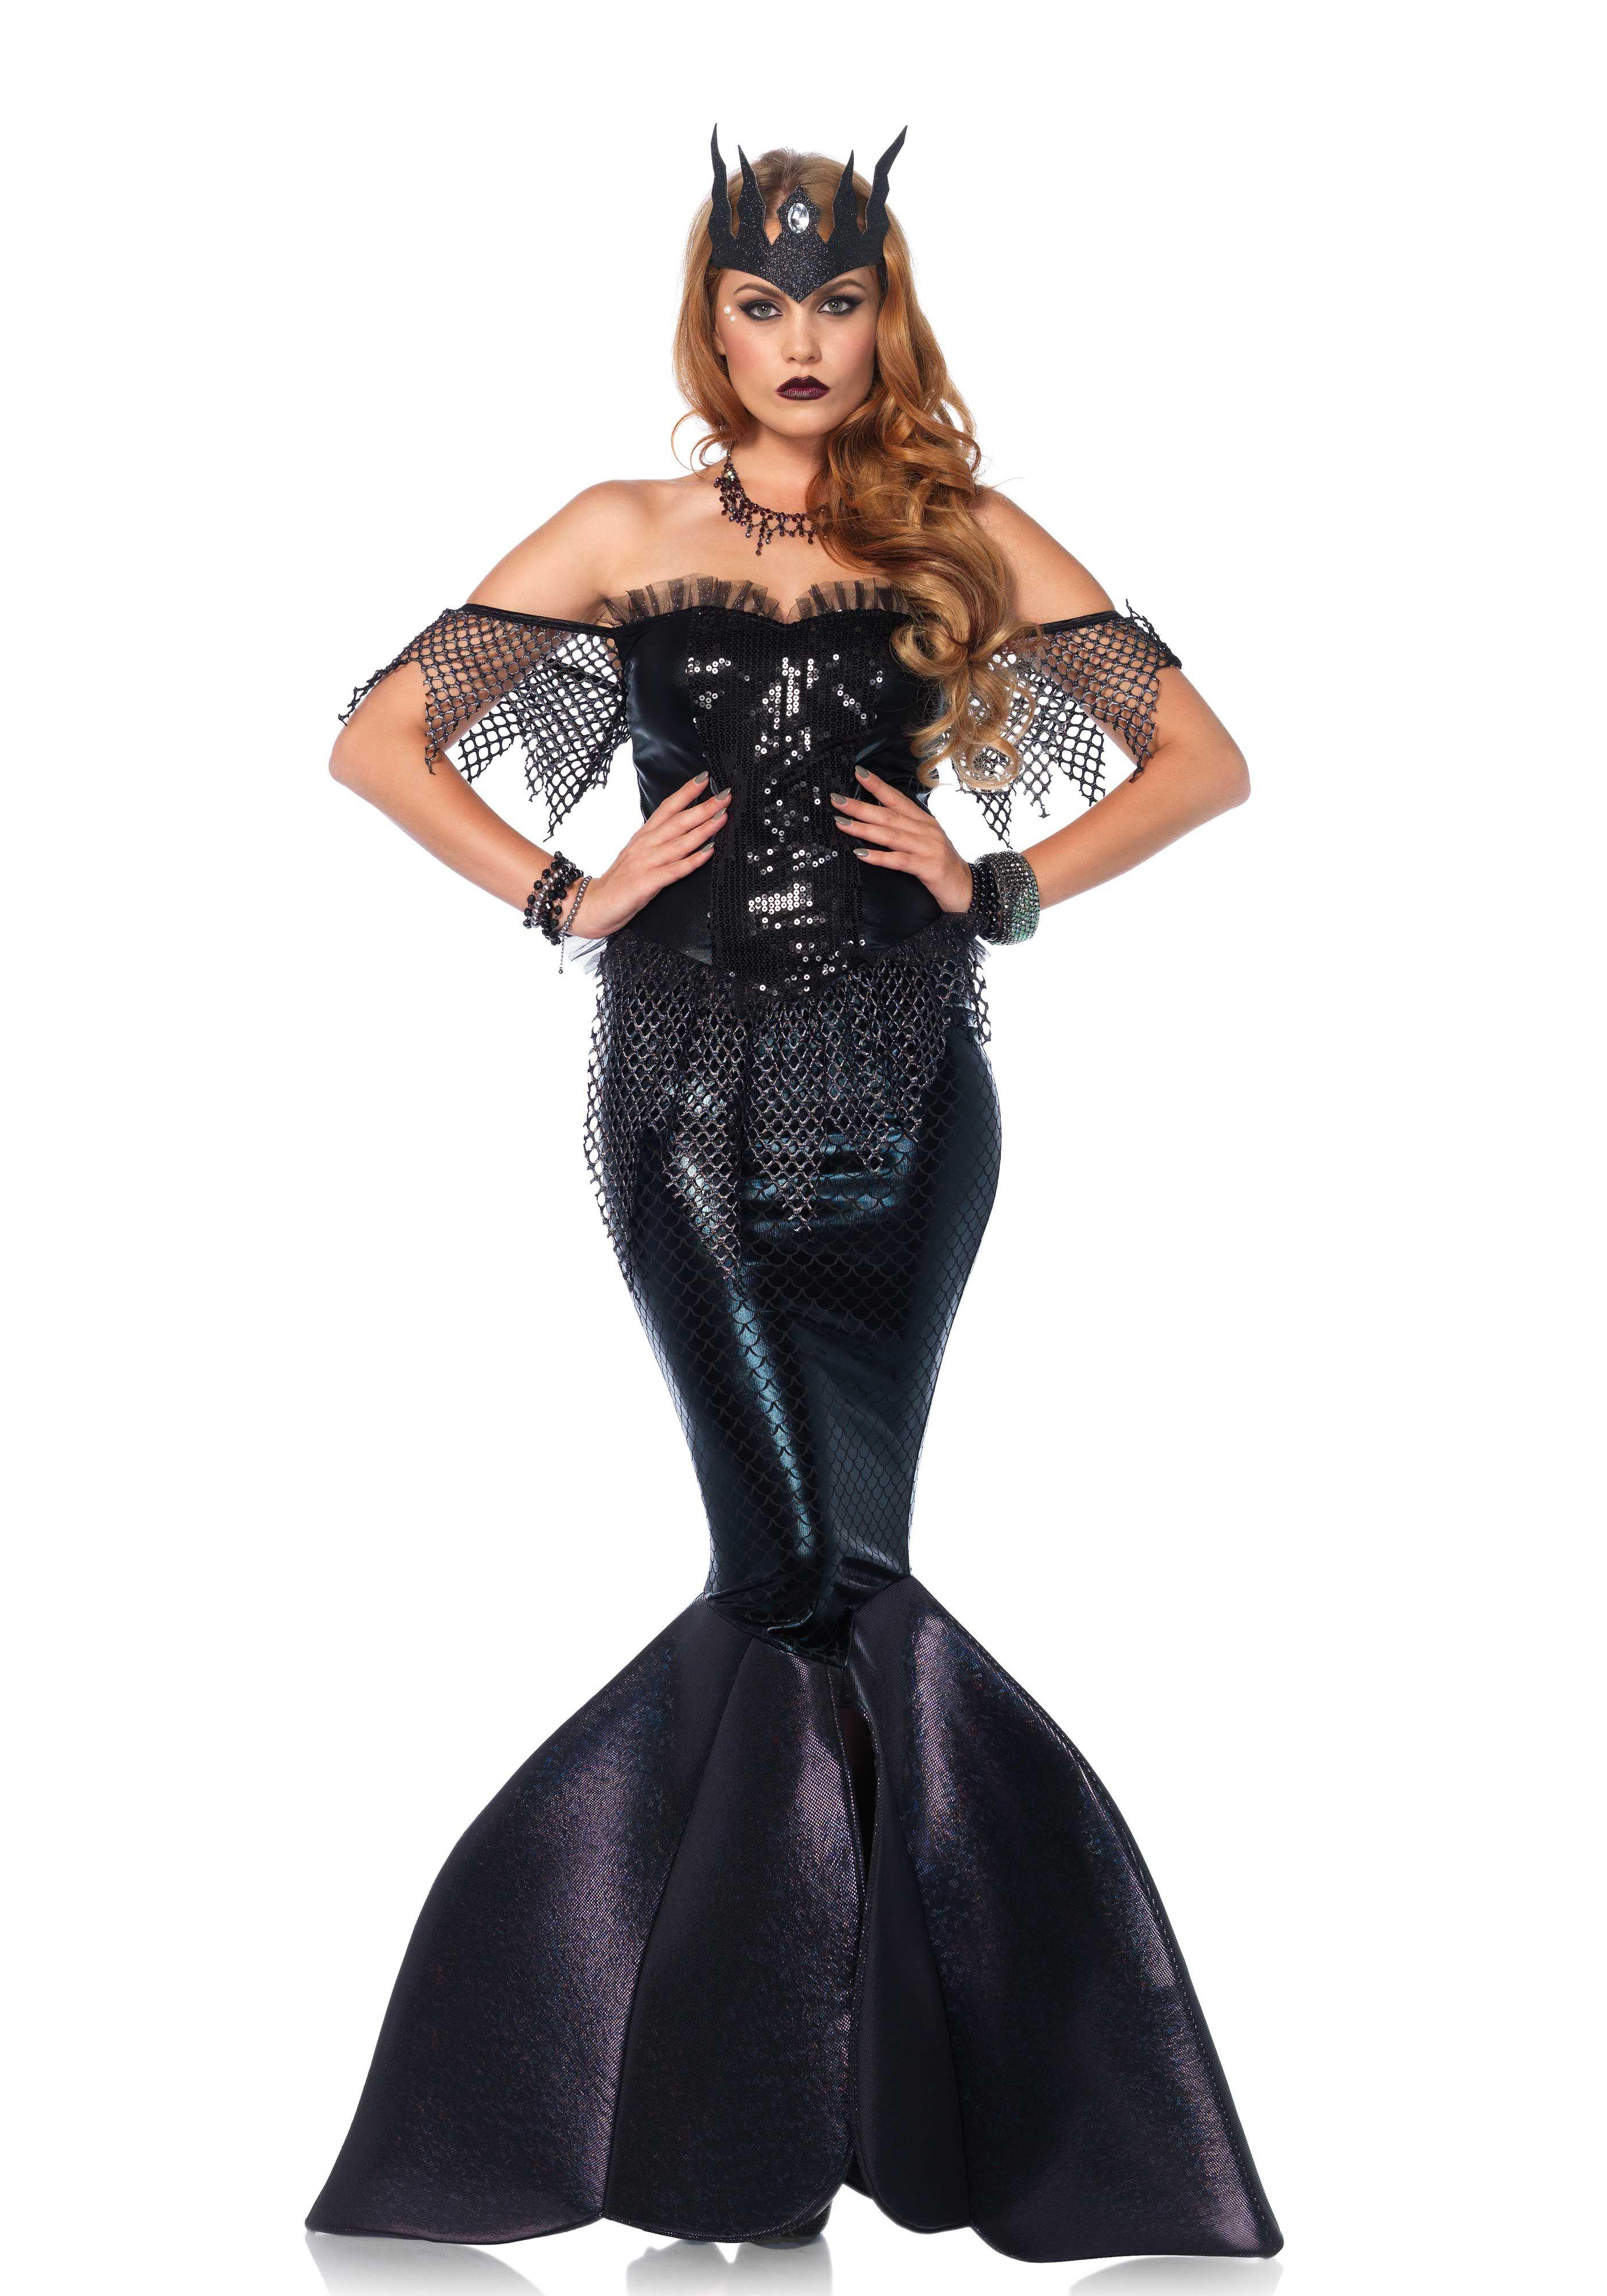 68094d78f Leg Avenue Dark Water Siren Costume  Halloween  Sinister  Black  Fantasy   Mermaid  Dress  Outfit  DressUp